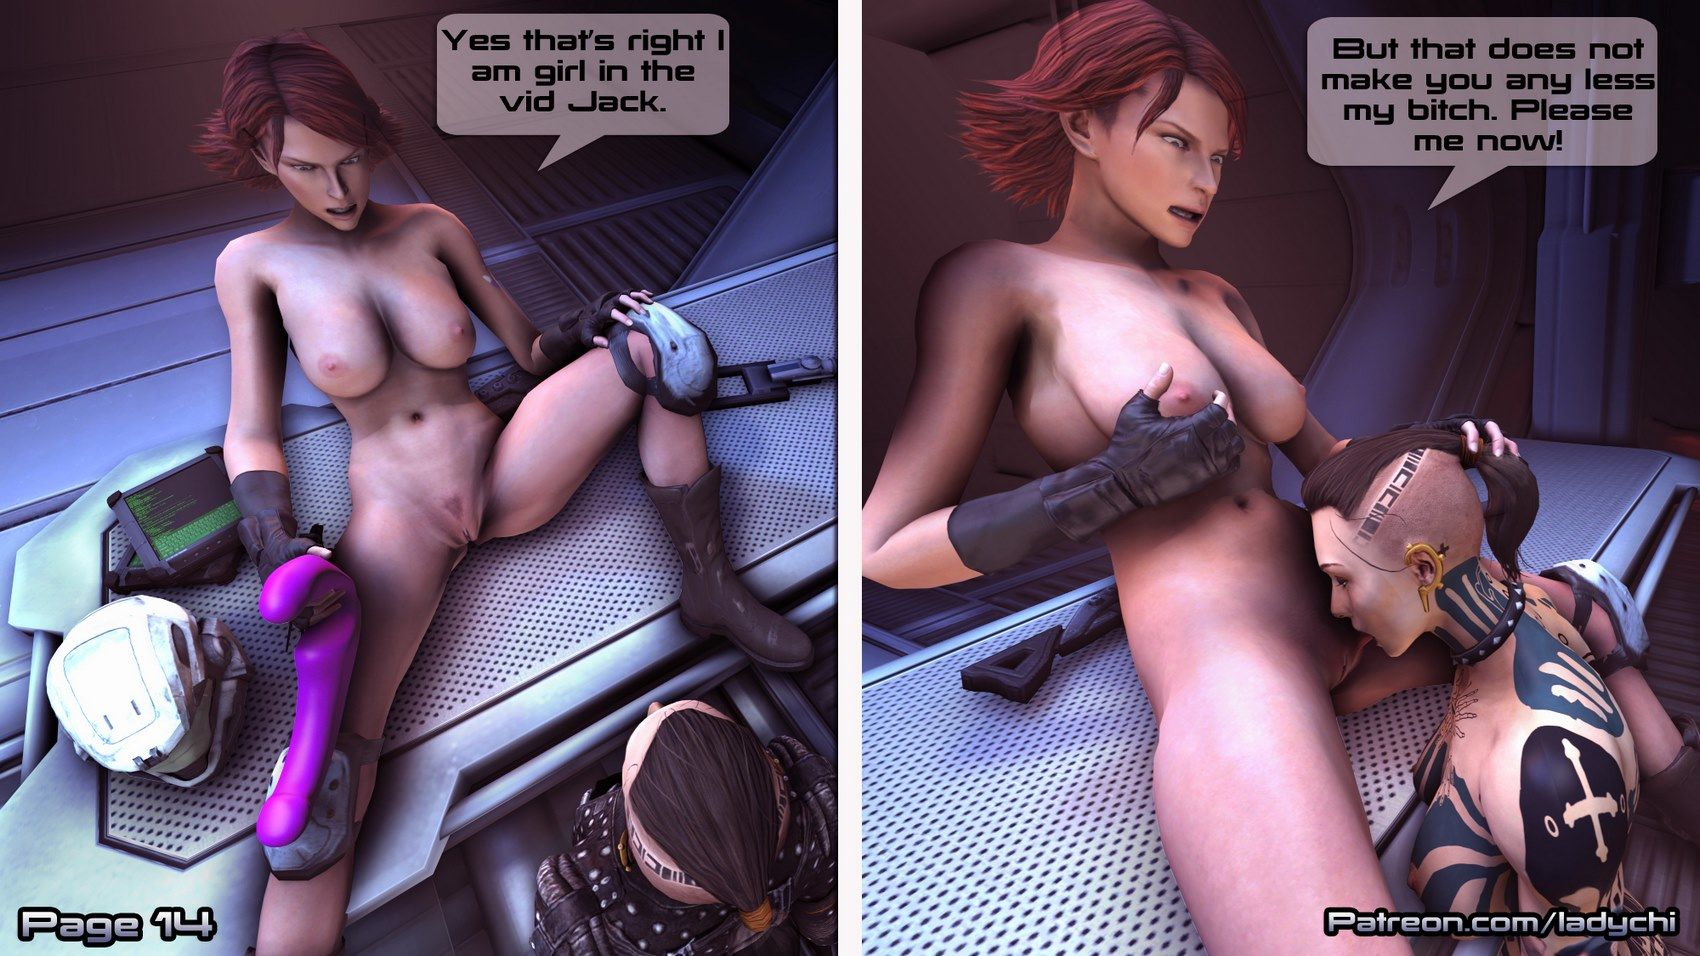 Jacks_Dream_Ladychi_(Mass_Effect) comix_57868.jpg